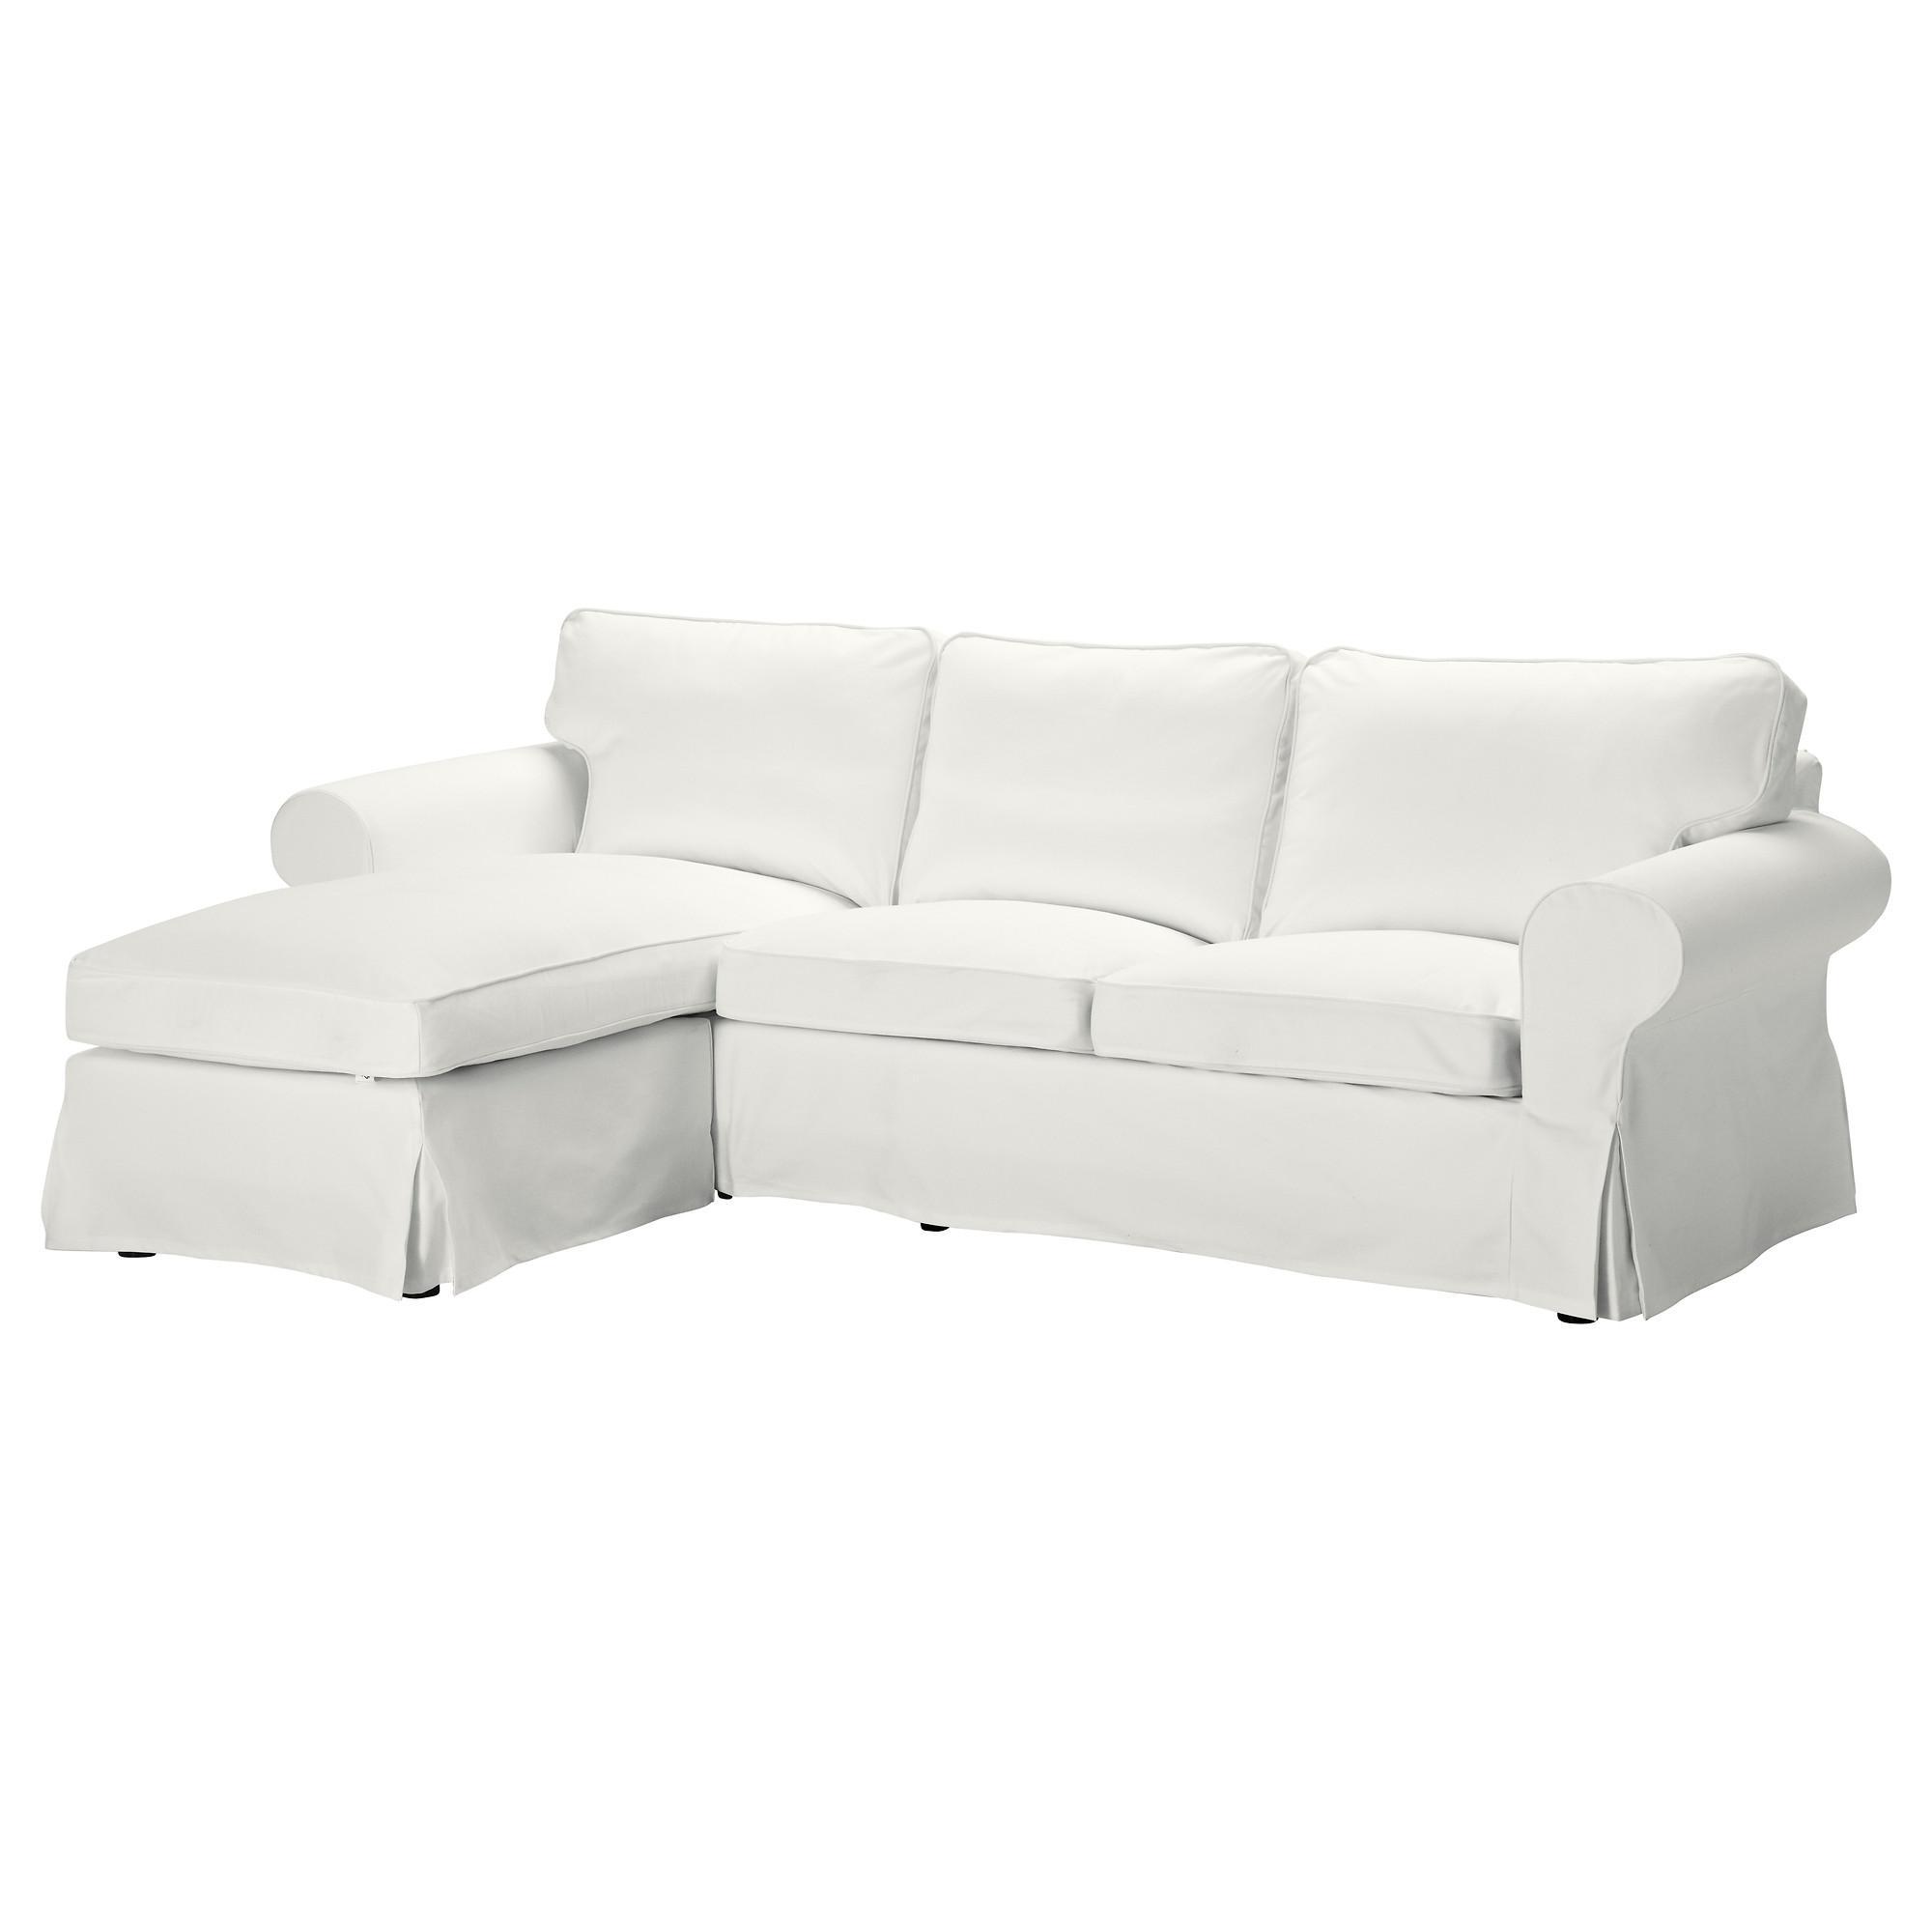 Ektorp 3 Seat Sofa With Chaise Longue/blekinge White – Ikea For Ikea Chaise Lounge Sofa (View 7 of 20)